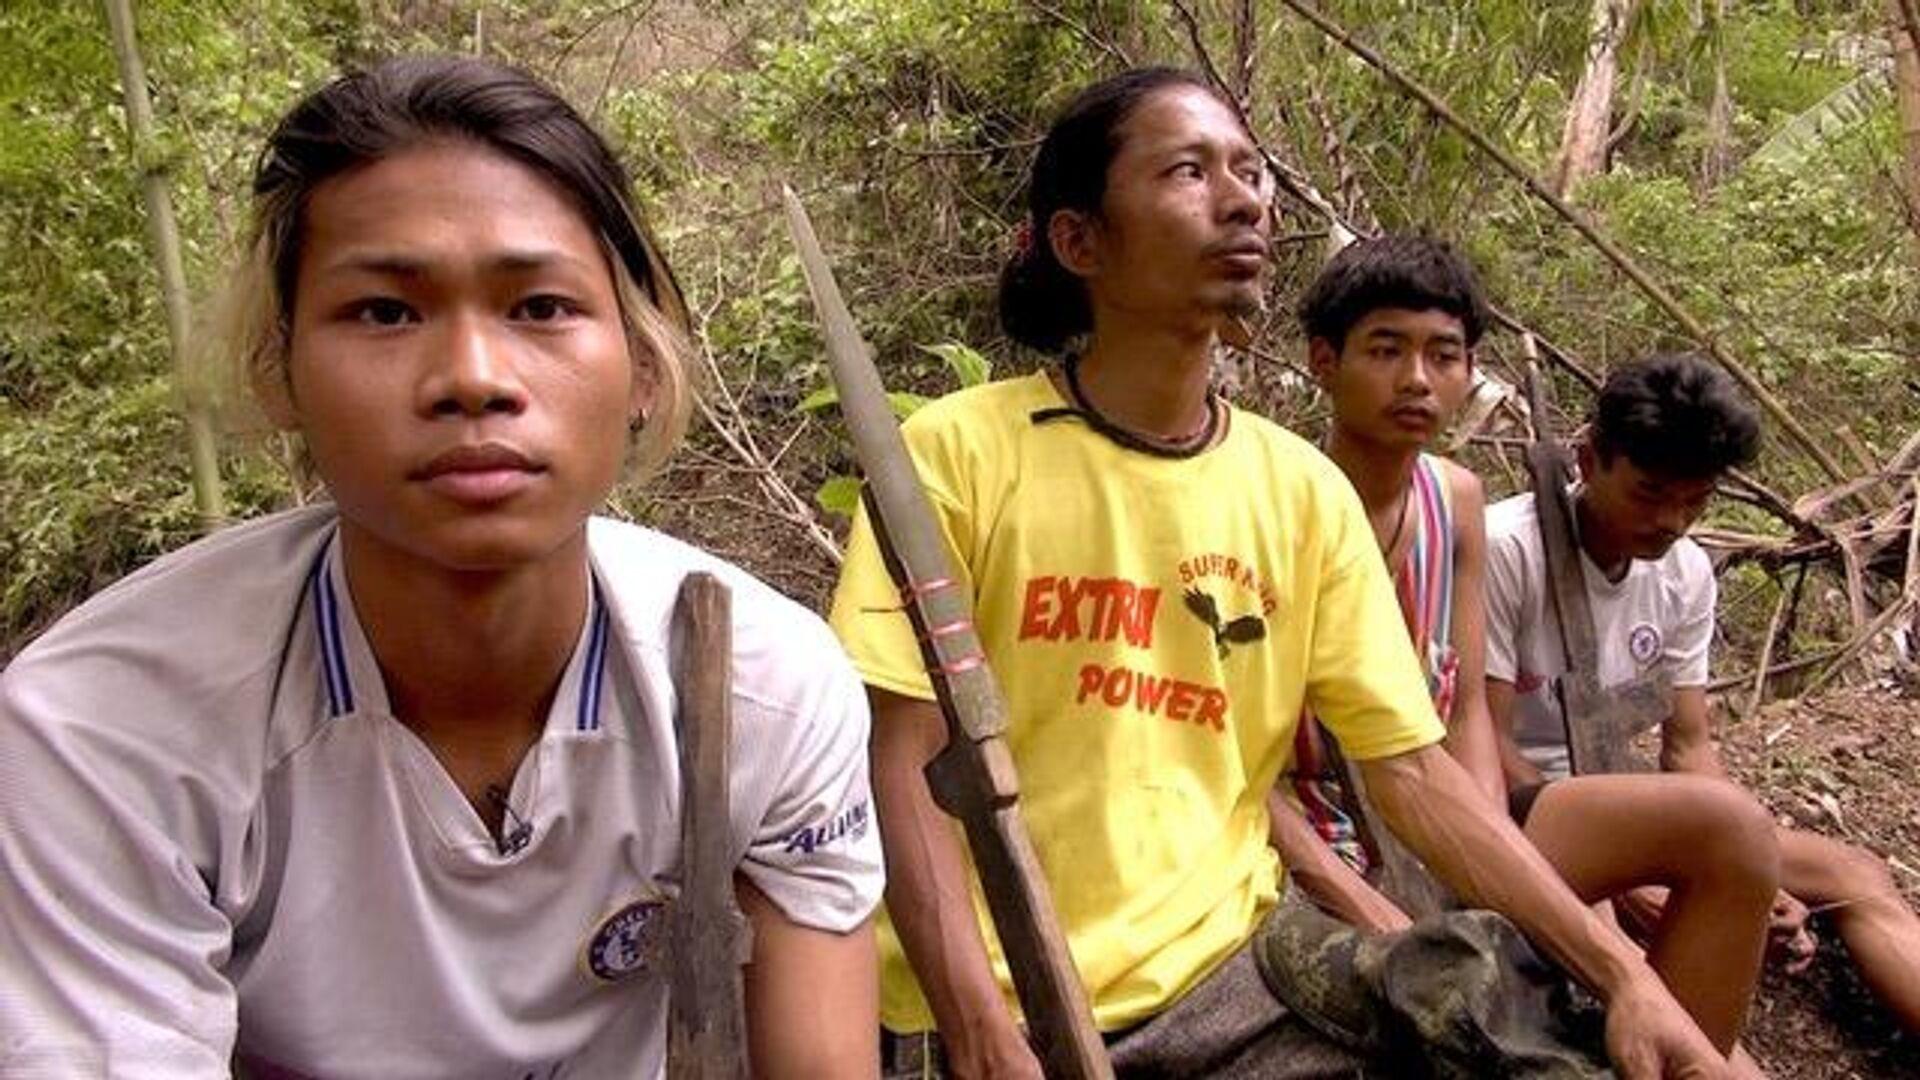 Myanmar, dove gli oppositori diventano guerrieri - Sputnik Italia, 1920, 22.05.2021